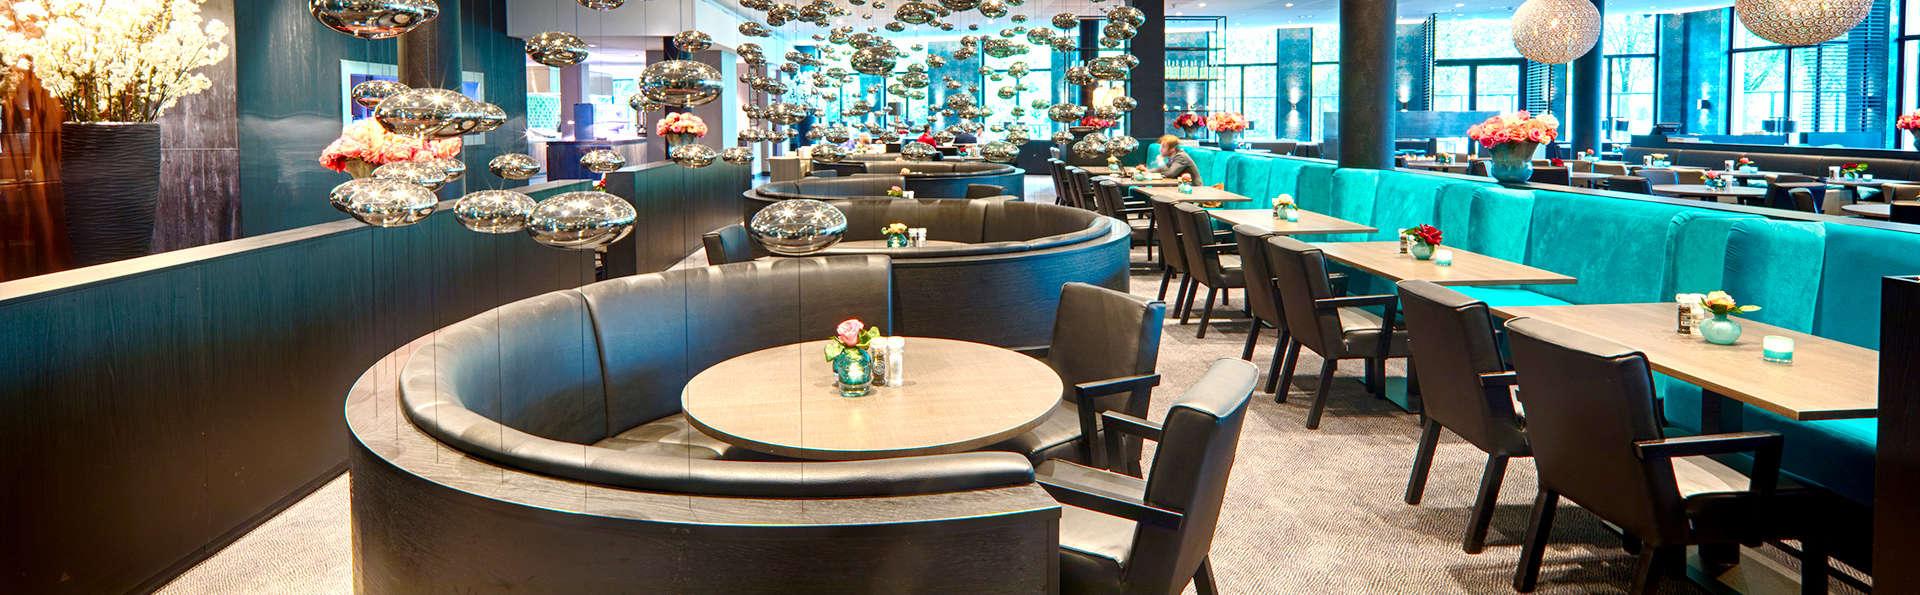 Van der Valk Hotel Utrecht - Edit_Restaurant5.jpg